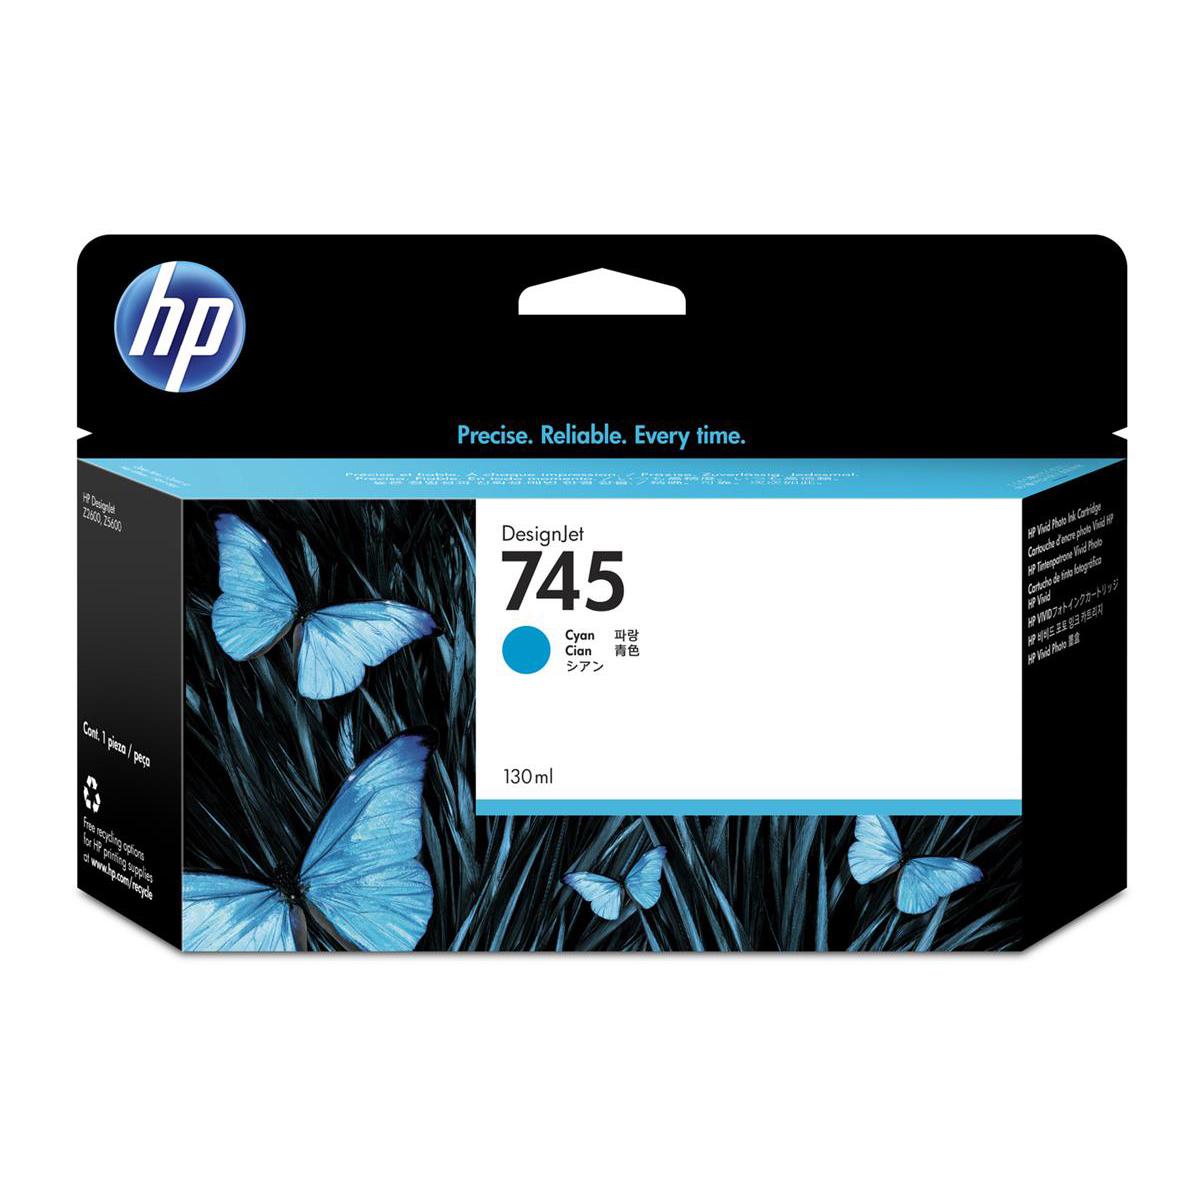 Hewlett Packard [HP] No.745 DesignJet Ink Cartridge Cyan 130ml Ref F9J97A *3to5 Day Leadtime*